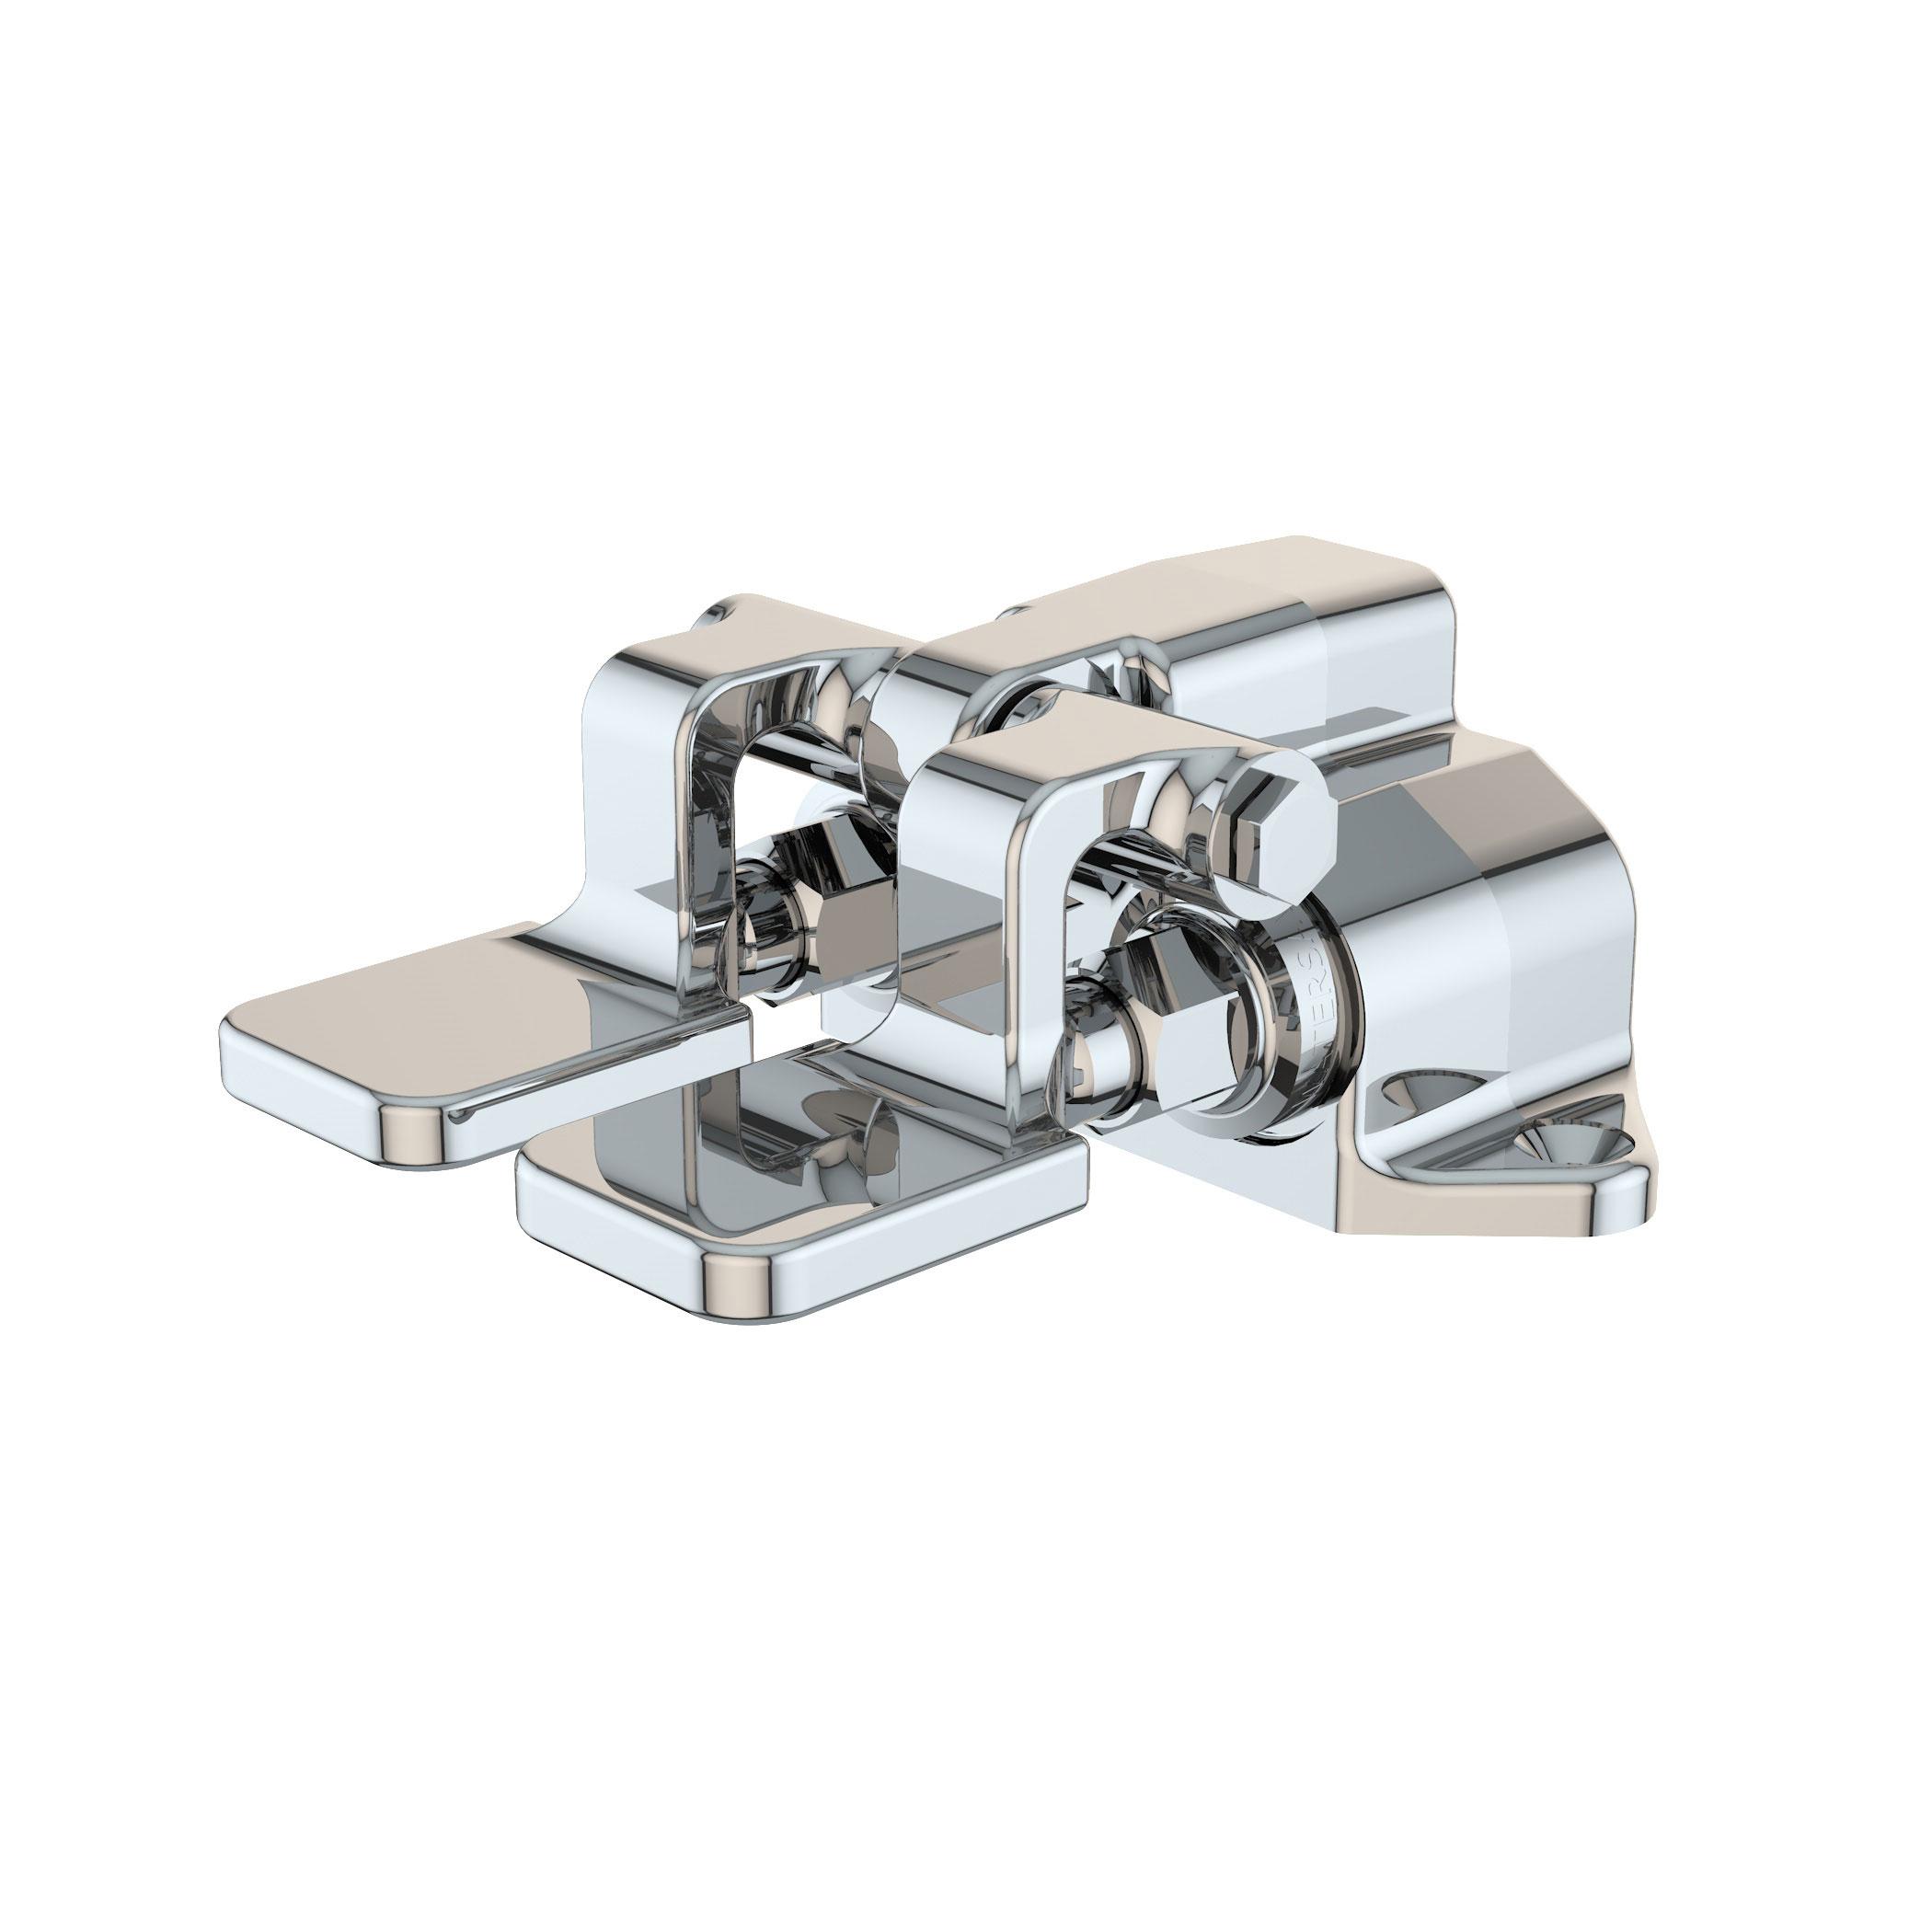 L3001 – WaterSaver Faucet Co.